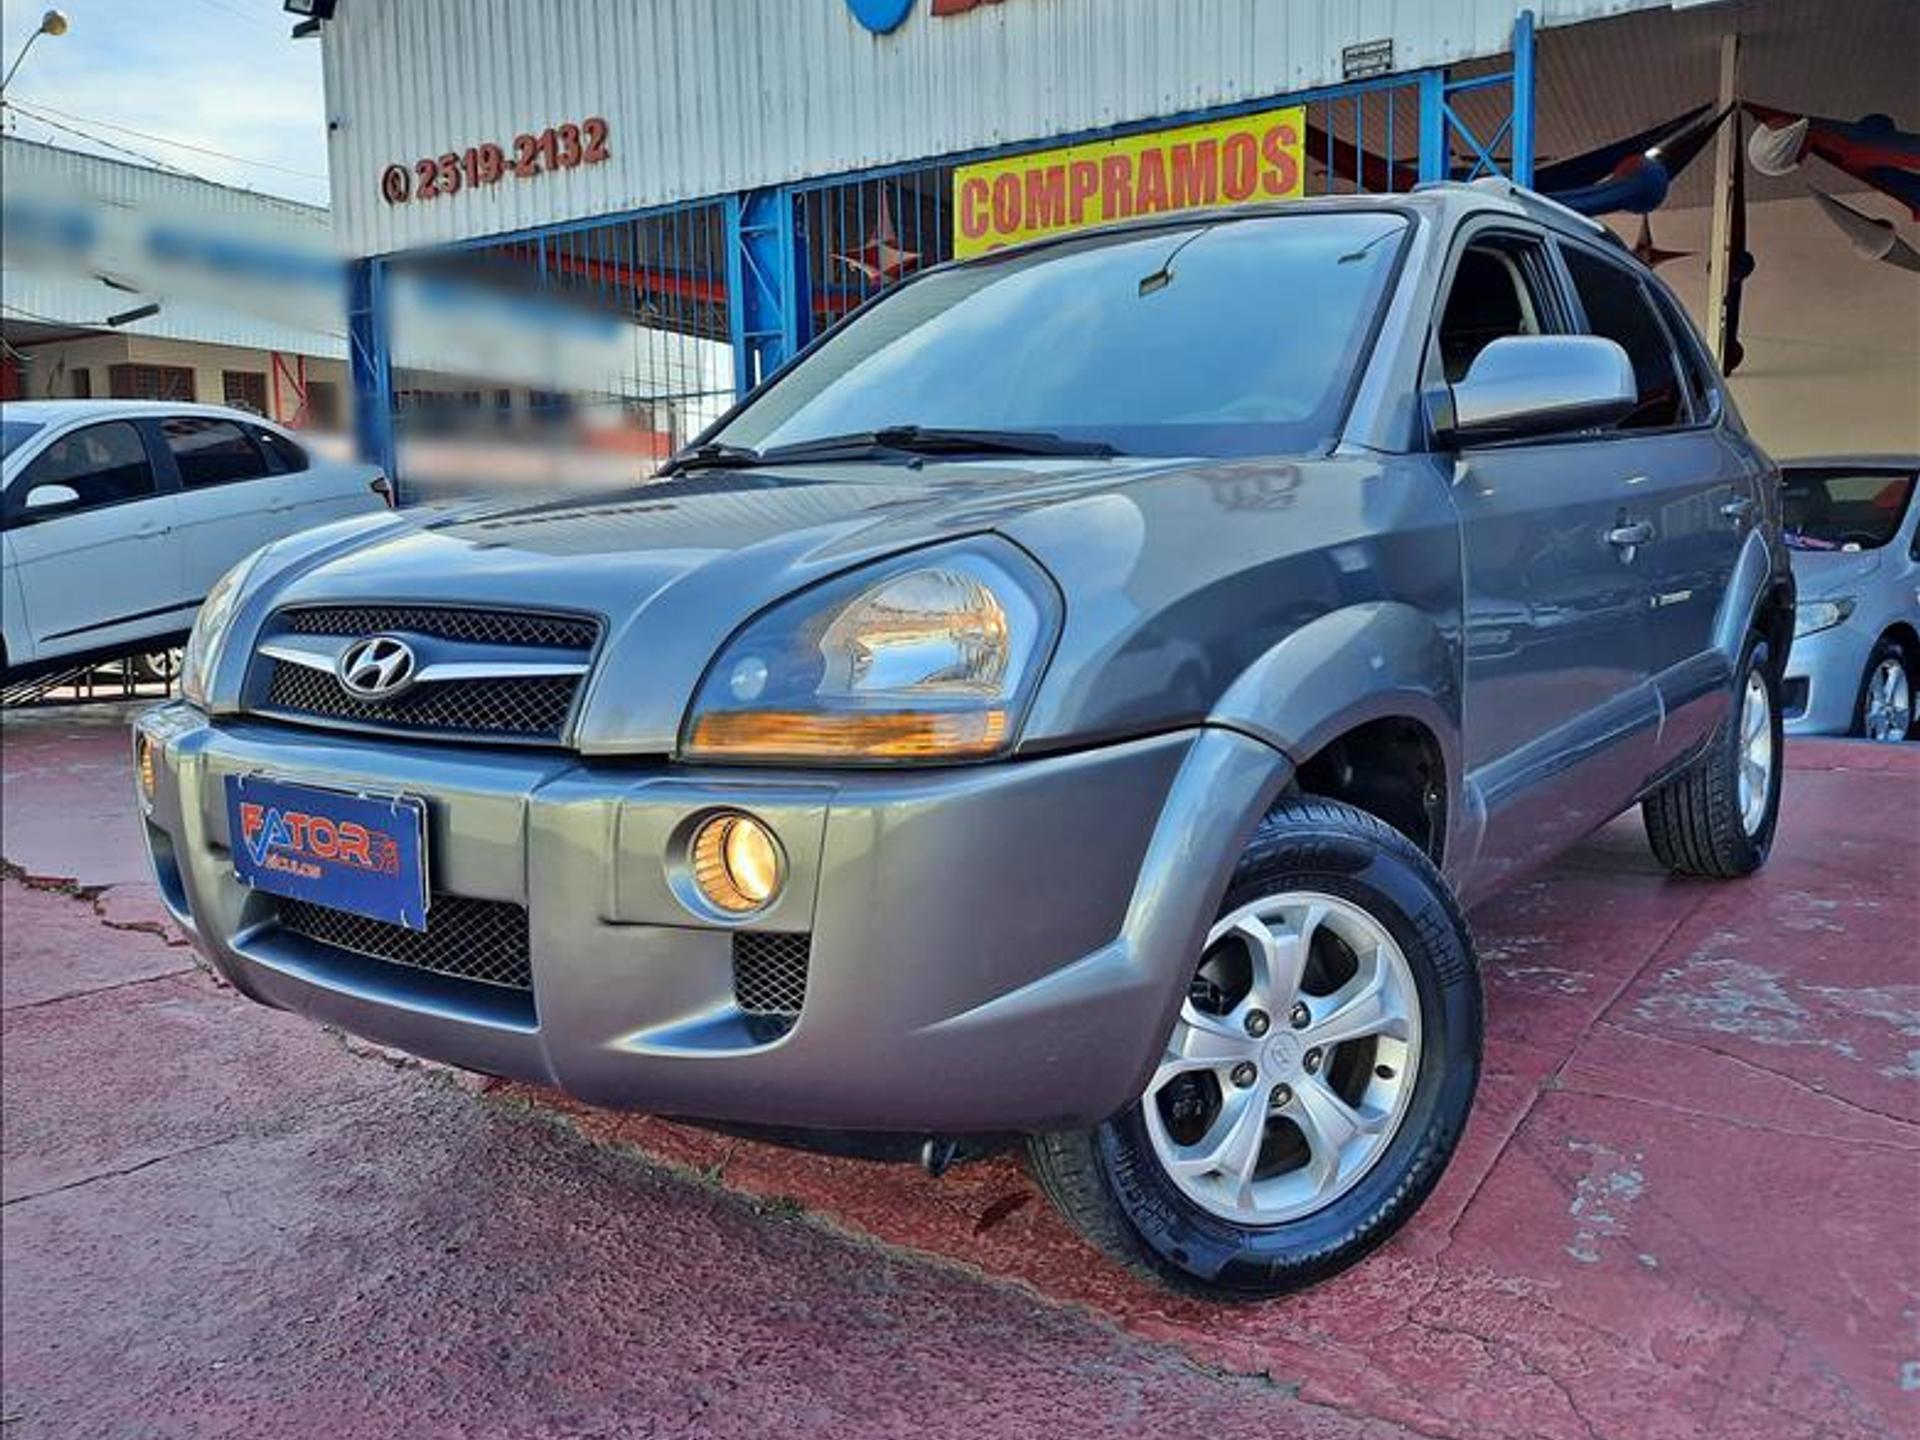 Hyundai Tucson 2.0 Mpfi Gls 16v 143cv 2wd Gasolina 4p Automatico Wmimagem16222791493